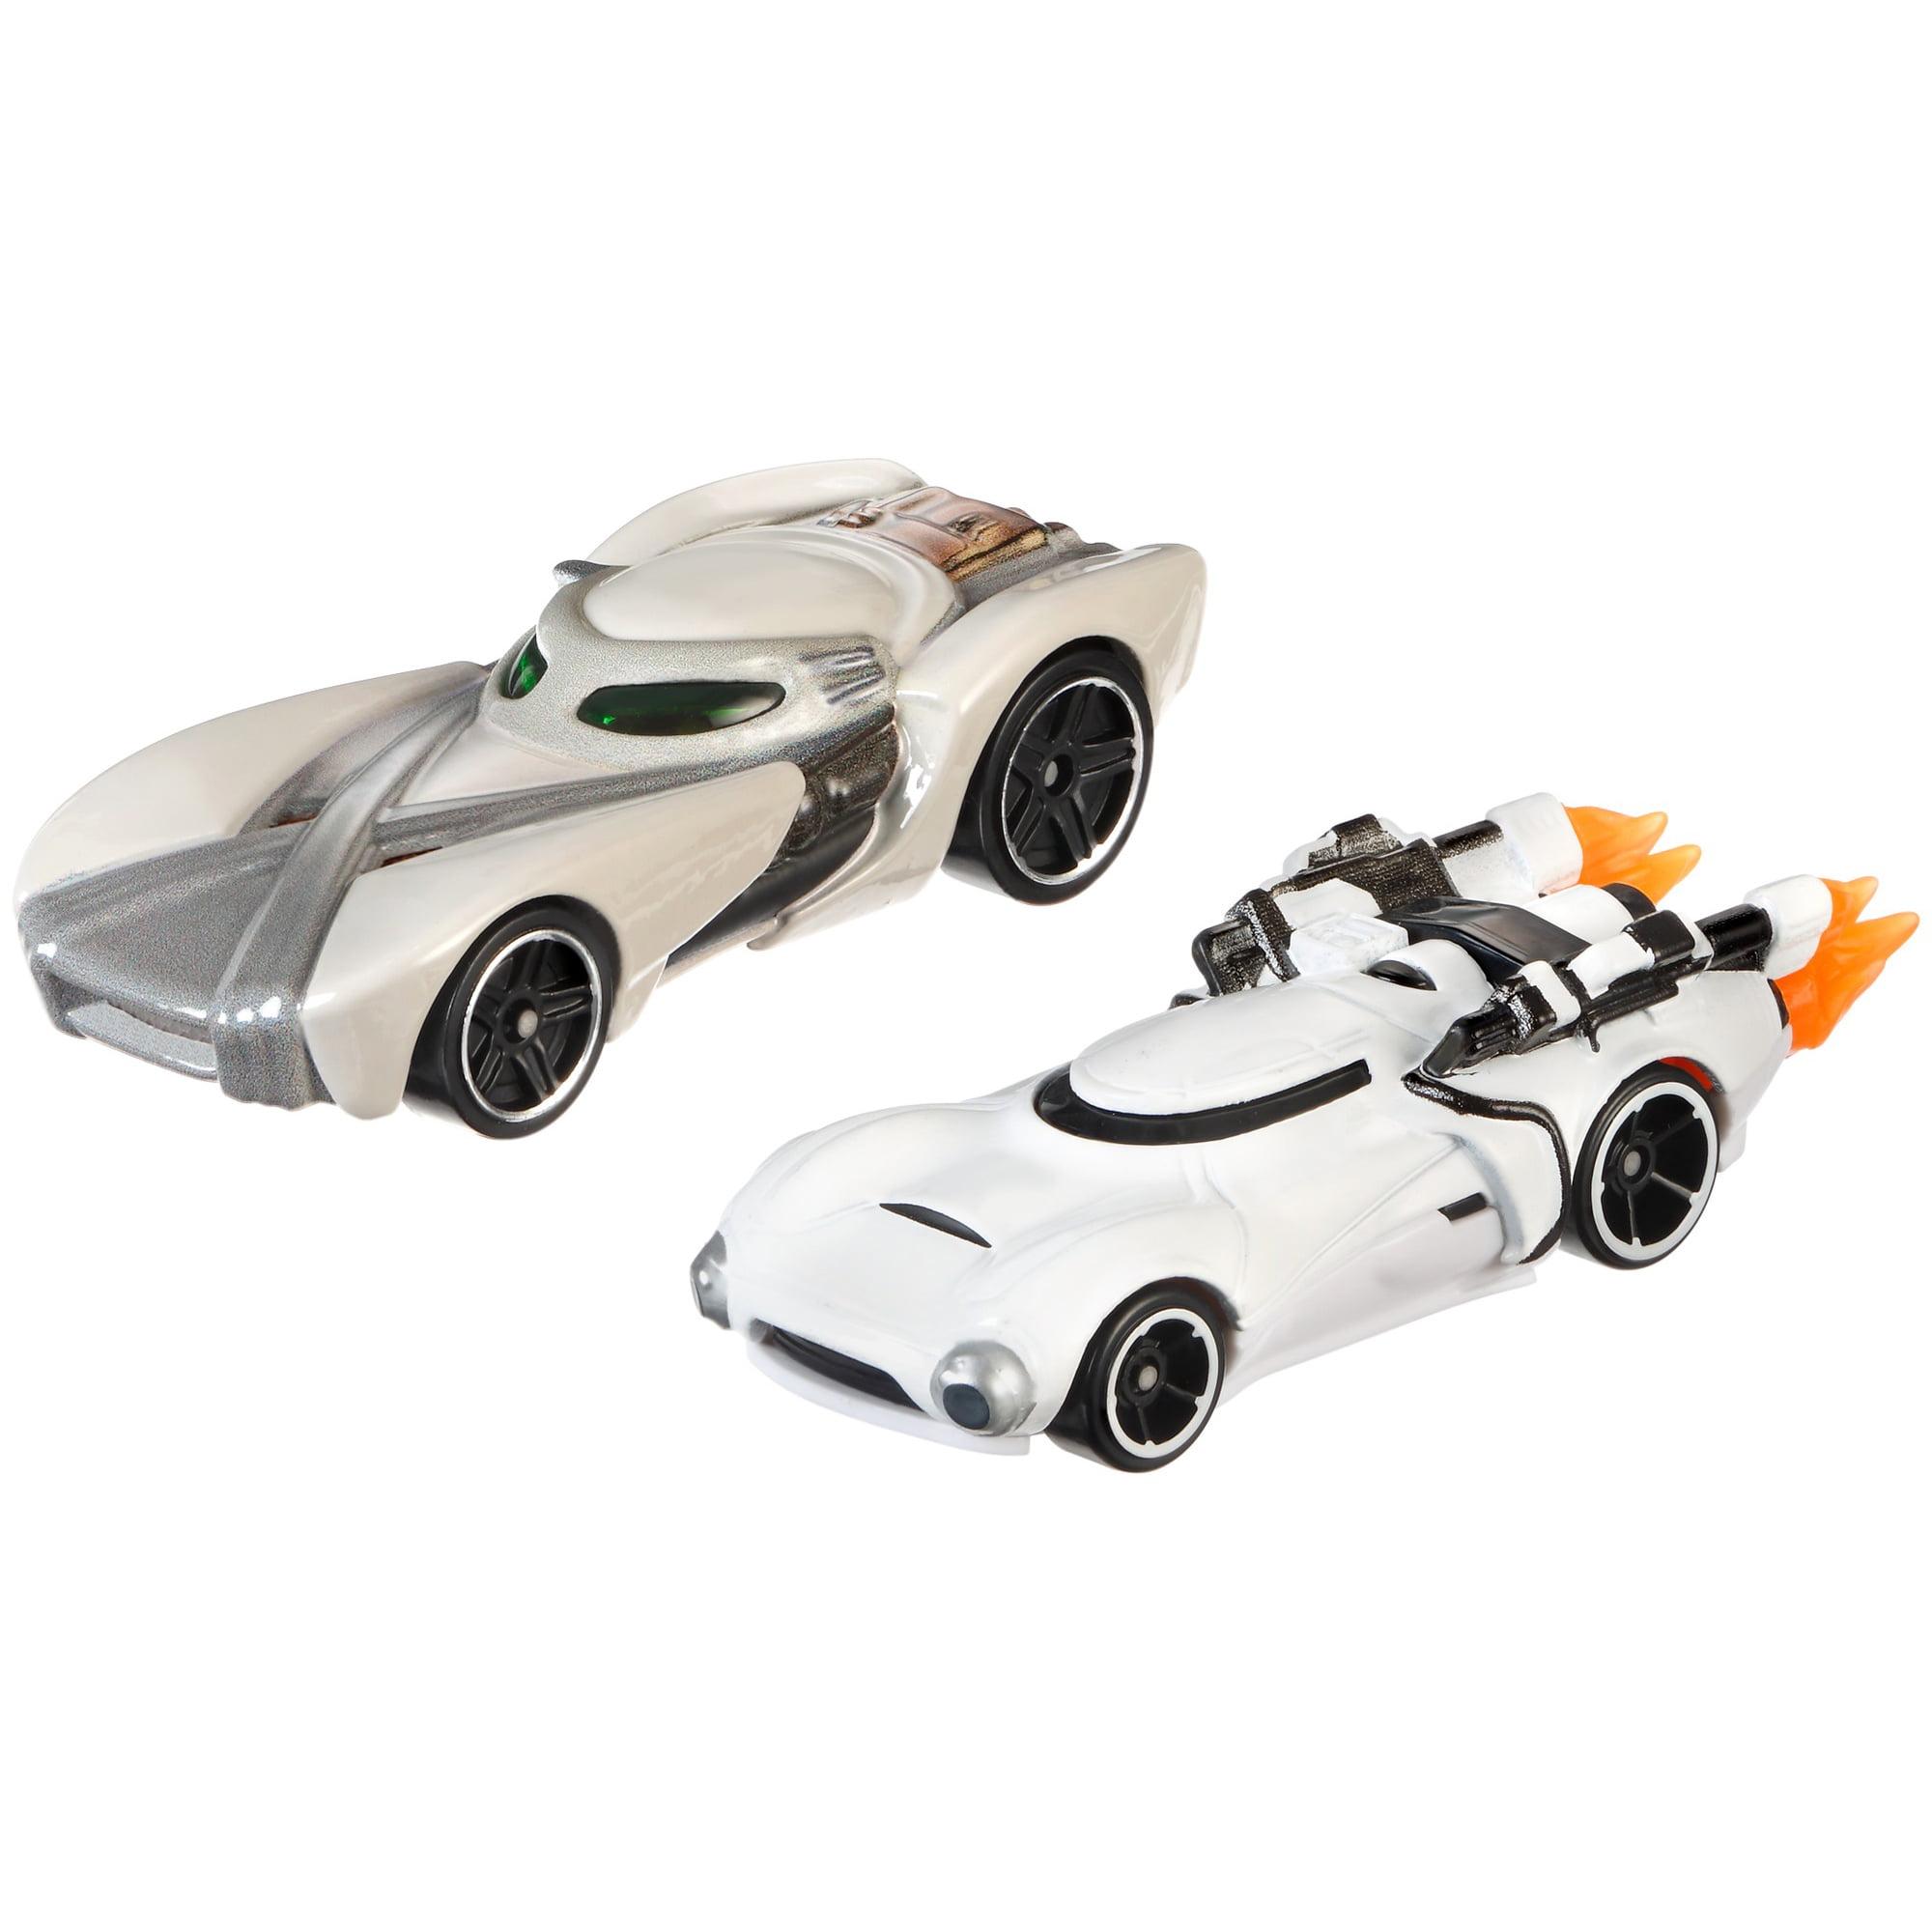 Hot Wheels Star Wars Rey Vs. First Order Flametrooper Character Car 2-Pack